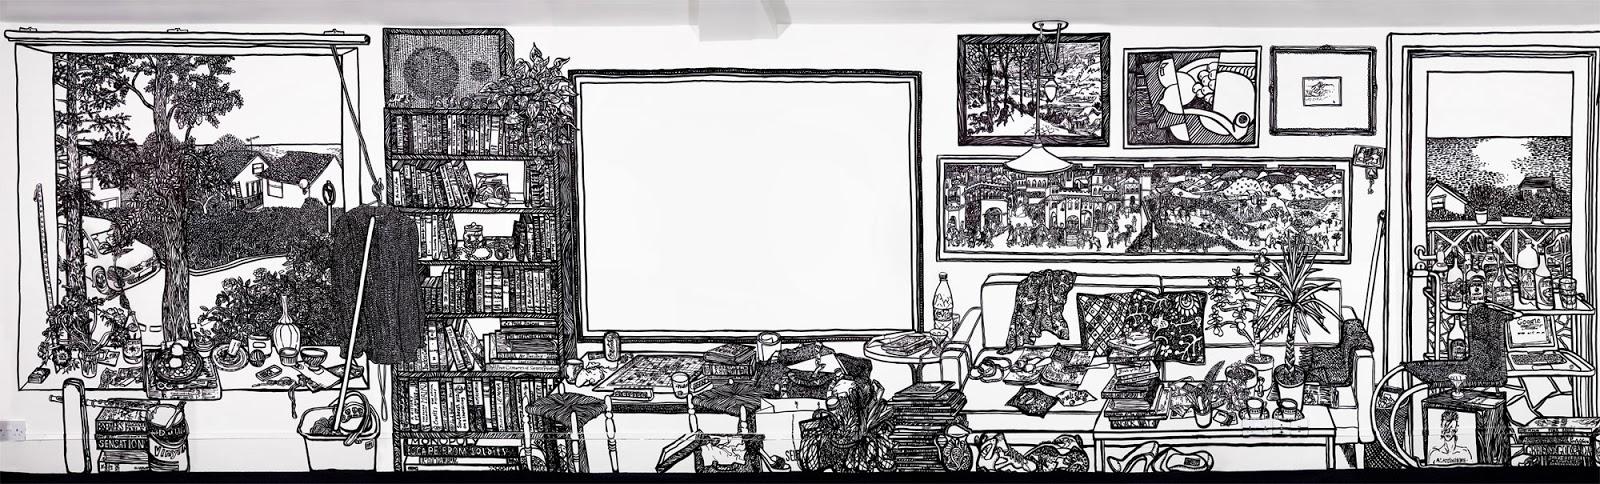 08-Artist-Charlotte-Mann-Draw-on-Walls-www-designstack-co